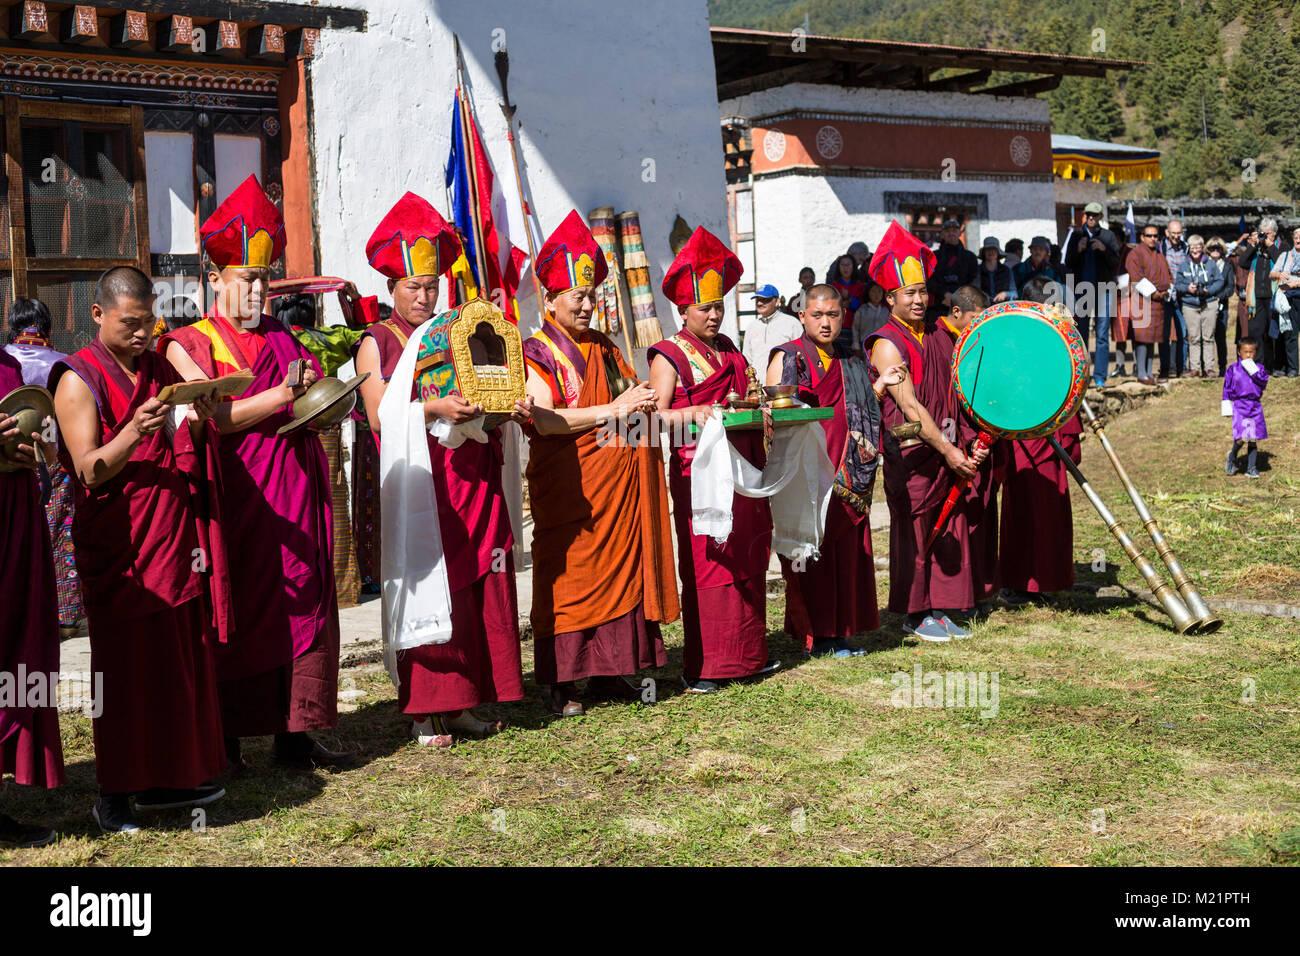 Prakhar Lhakhang, Bumthang, Bhutan.  Monks at the Duechoed Religious Festival (Tsechu). - Stock Image